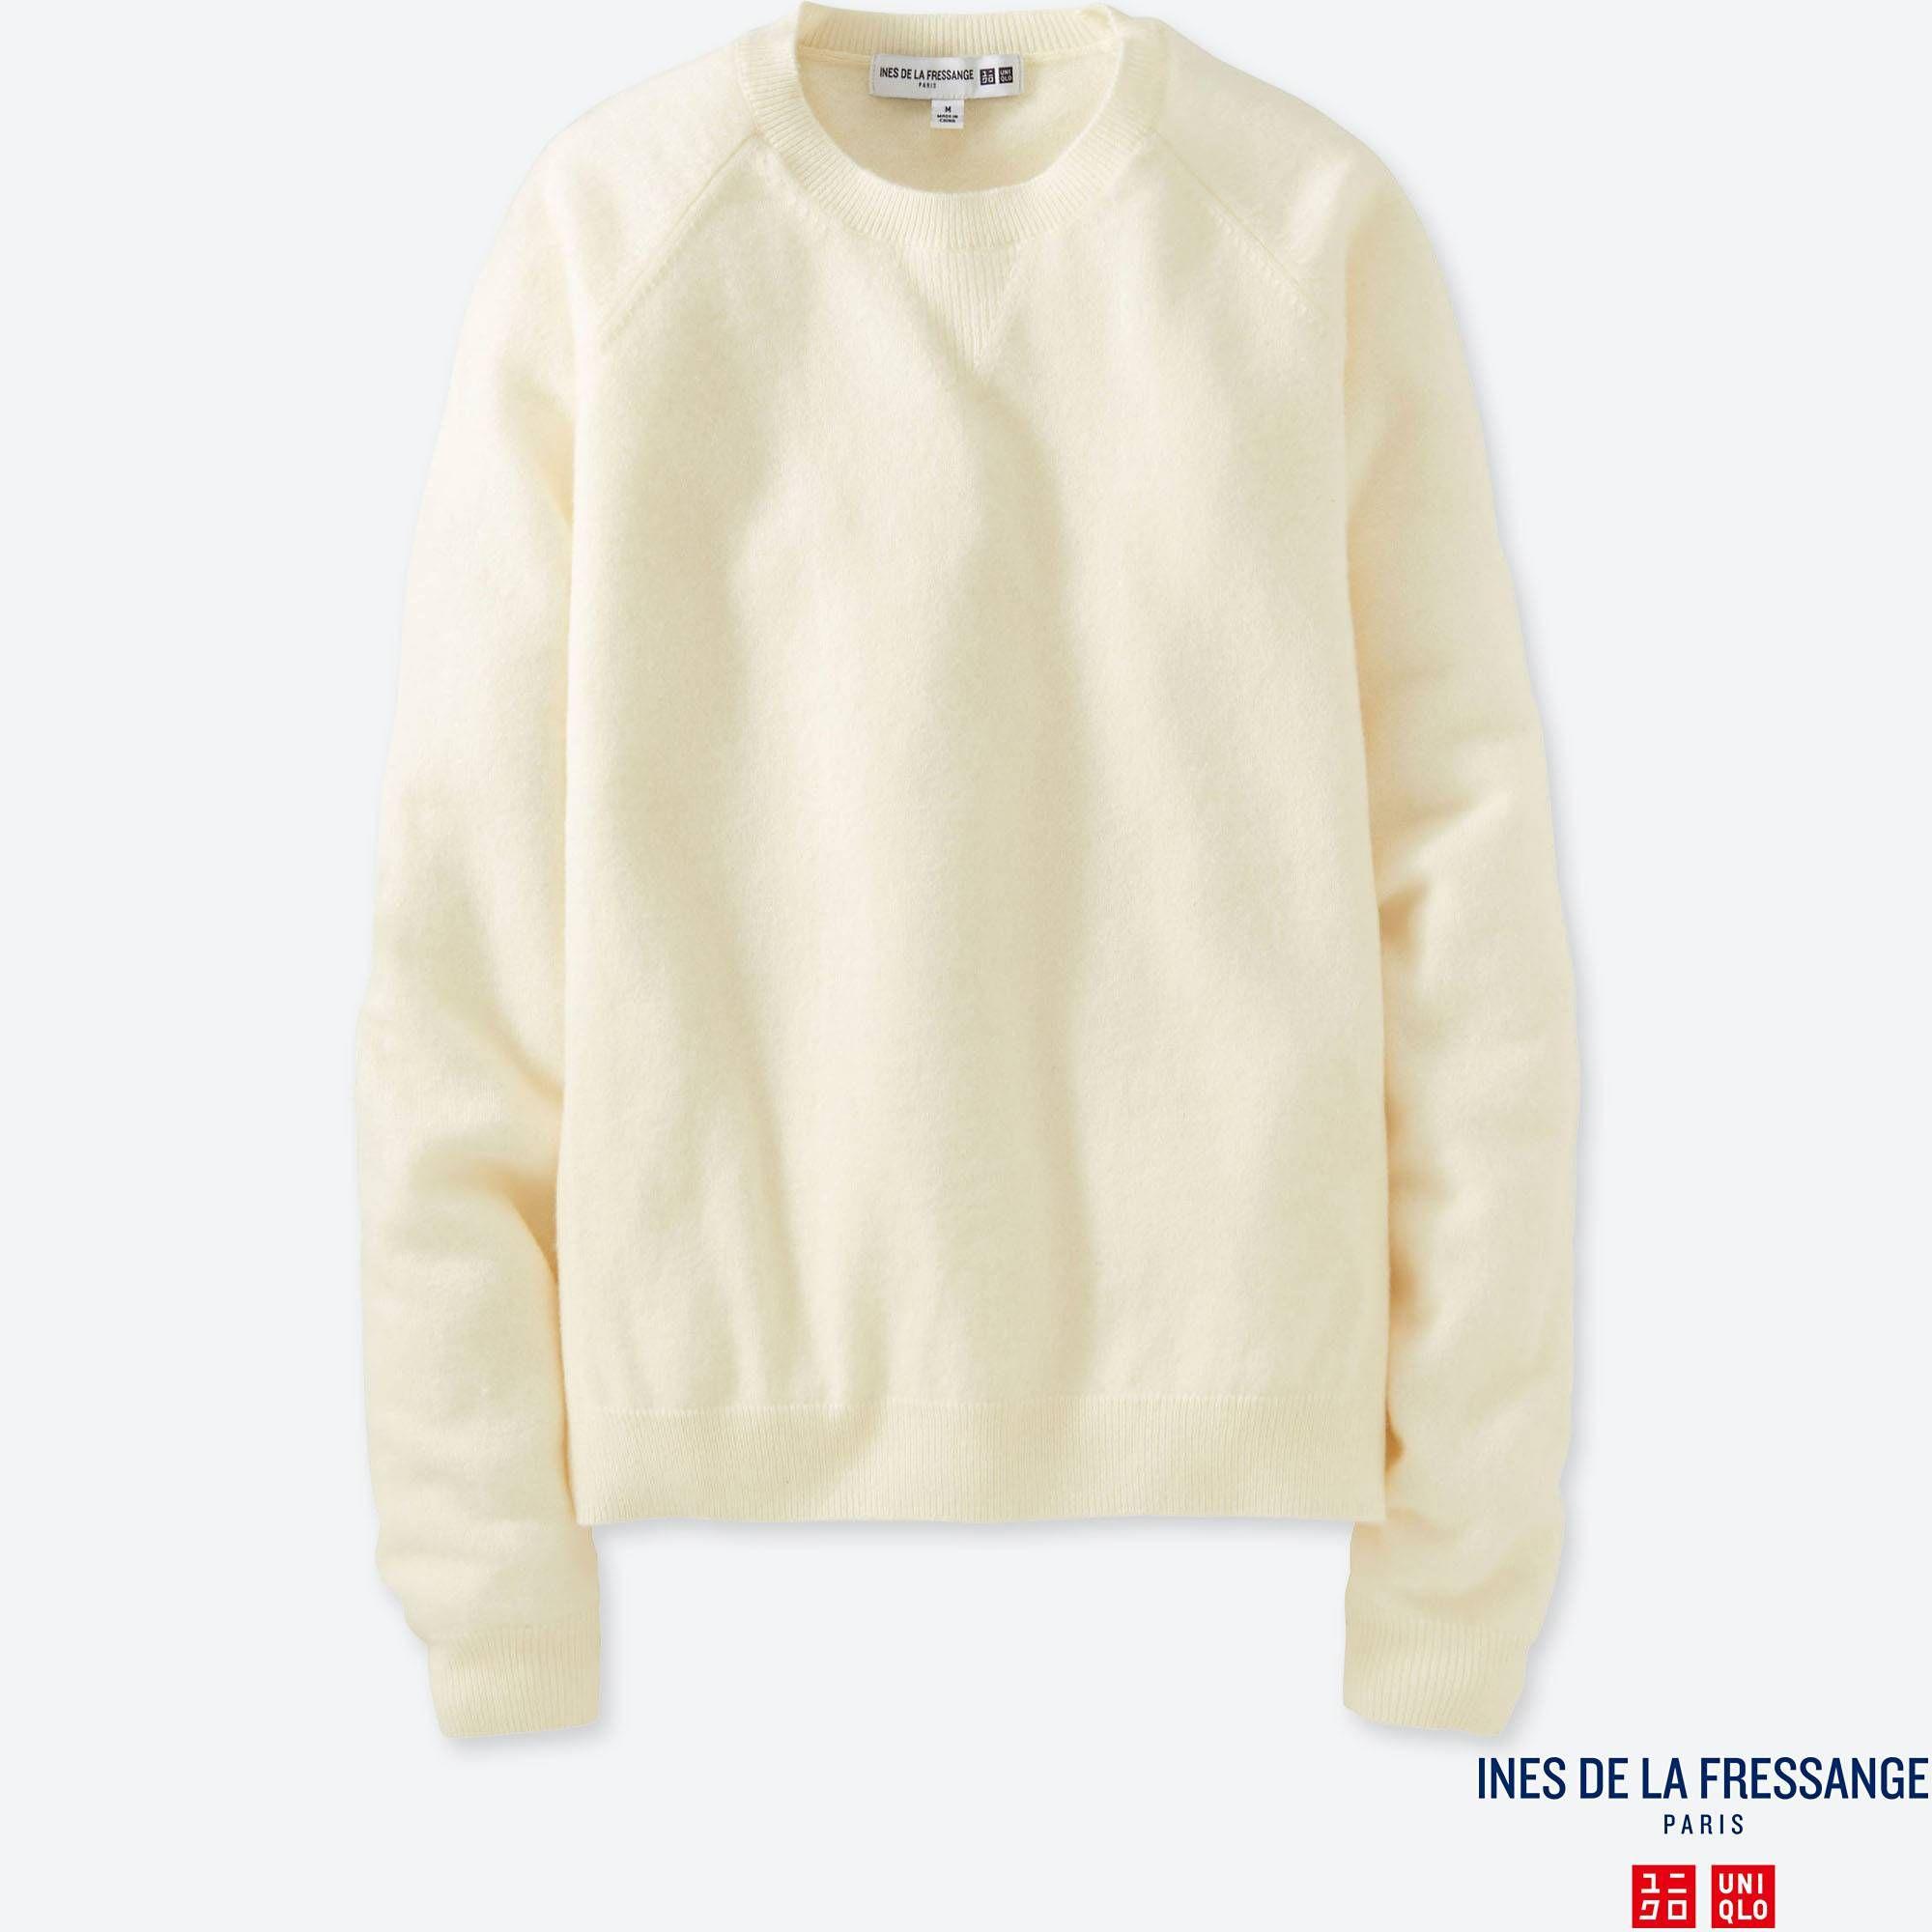 Women idlf cashmere crewneck sweater | Crewneck sweaters, Cashmere ...